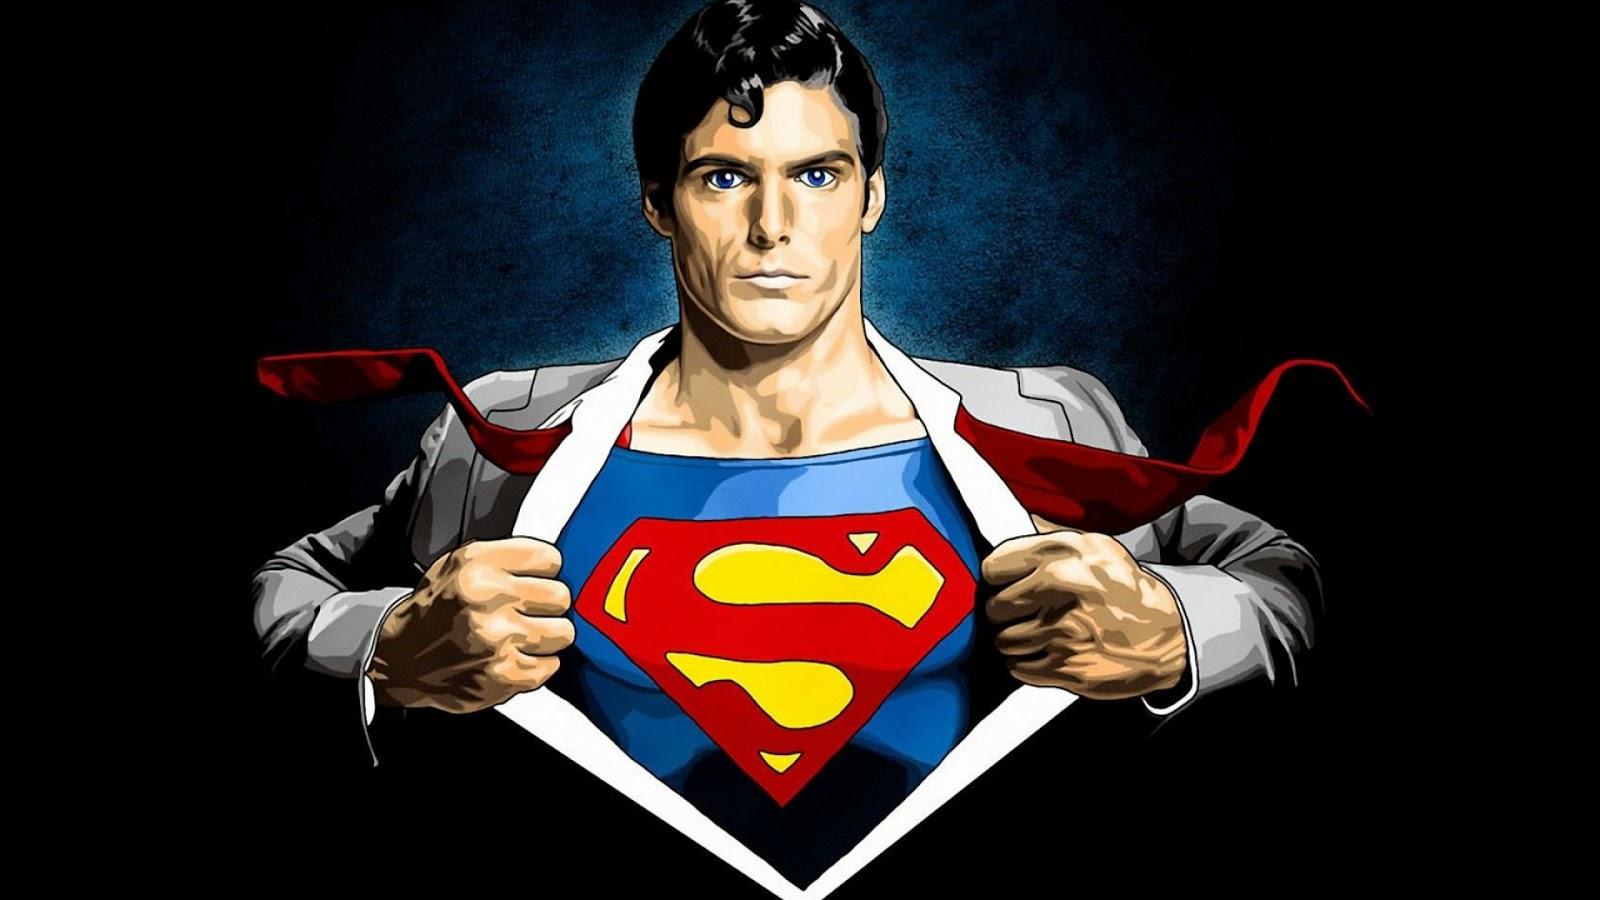 Gambar Baru Superman